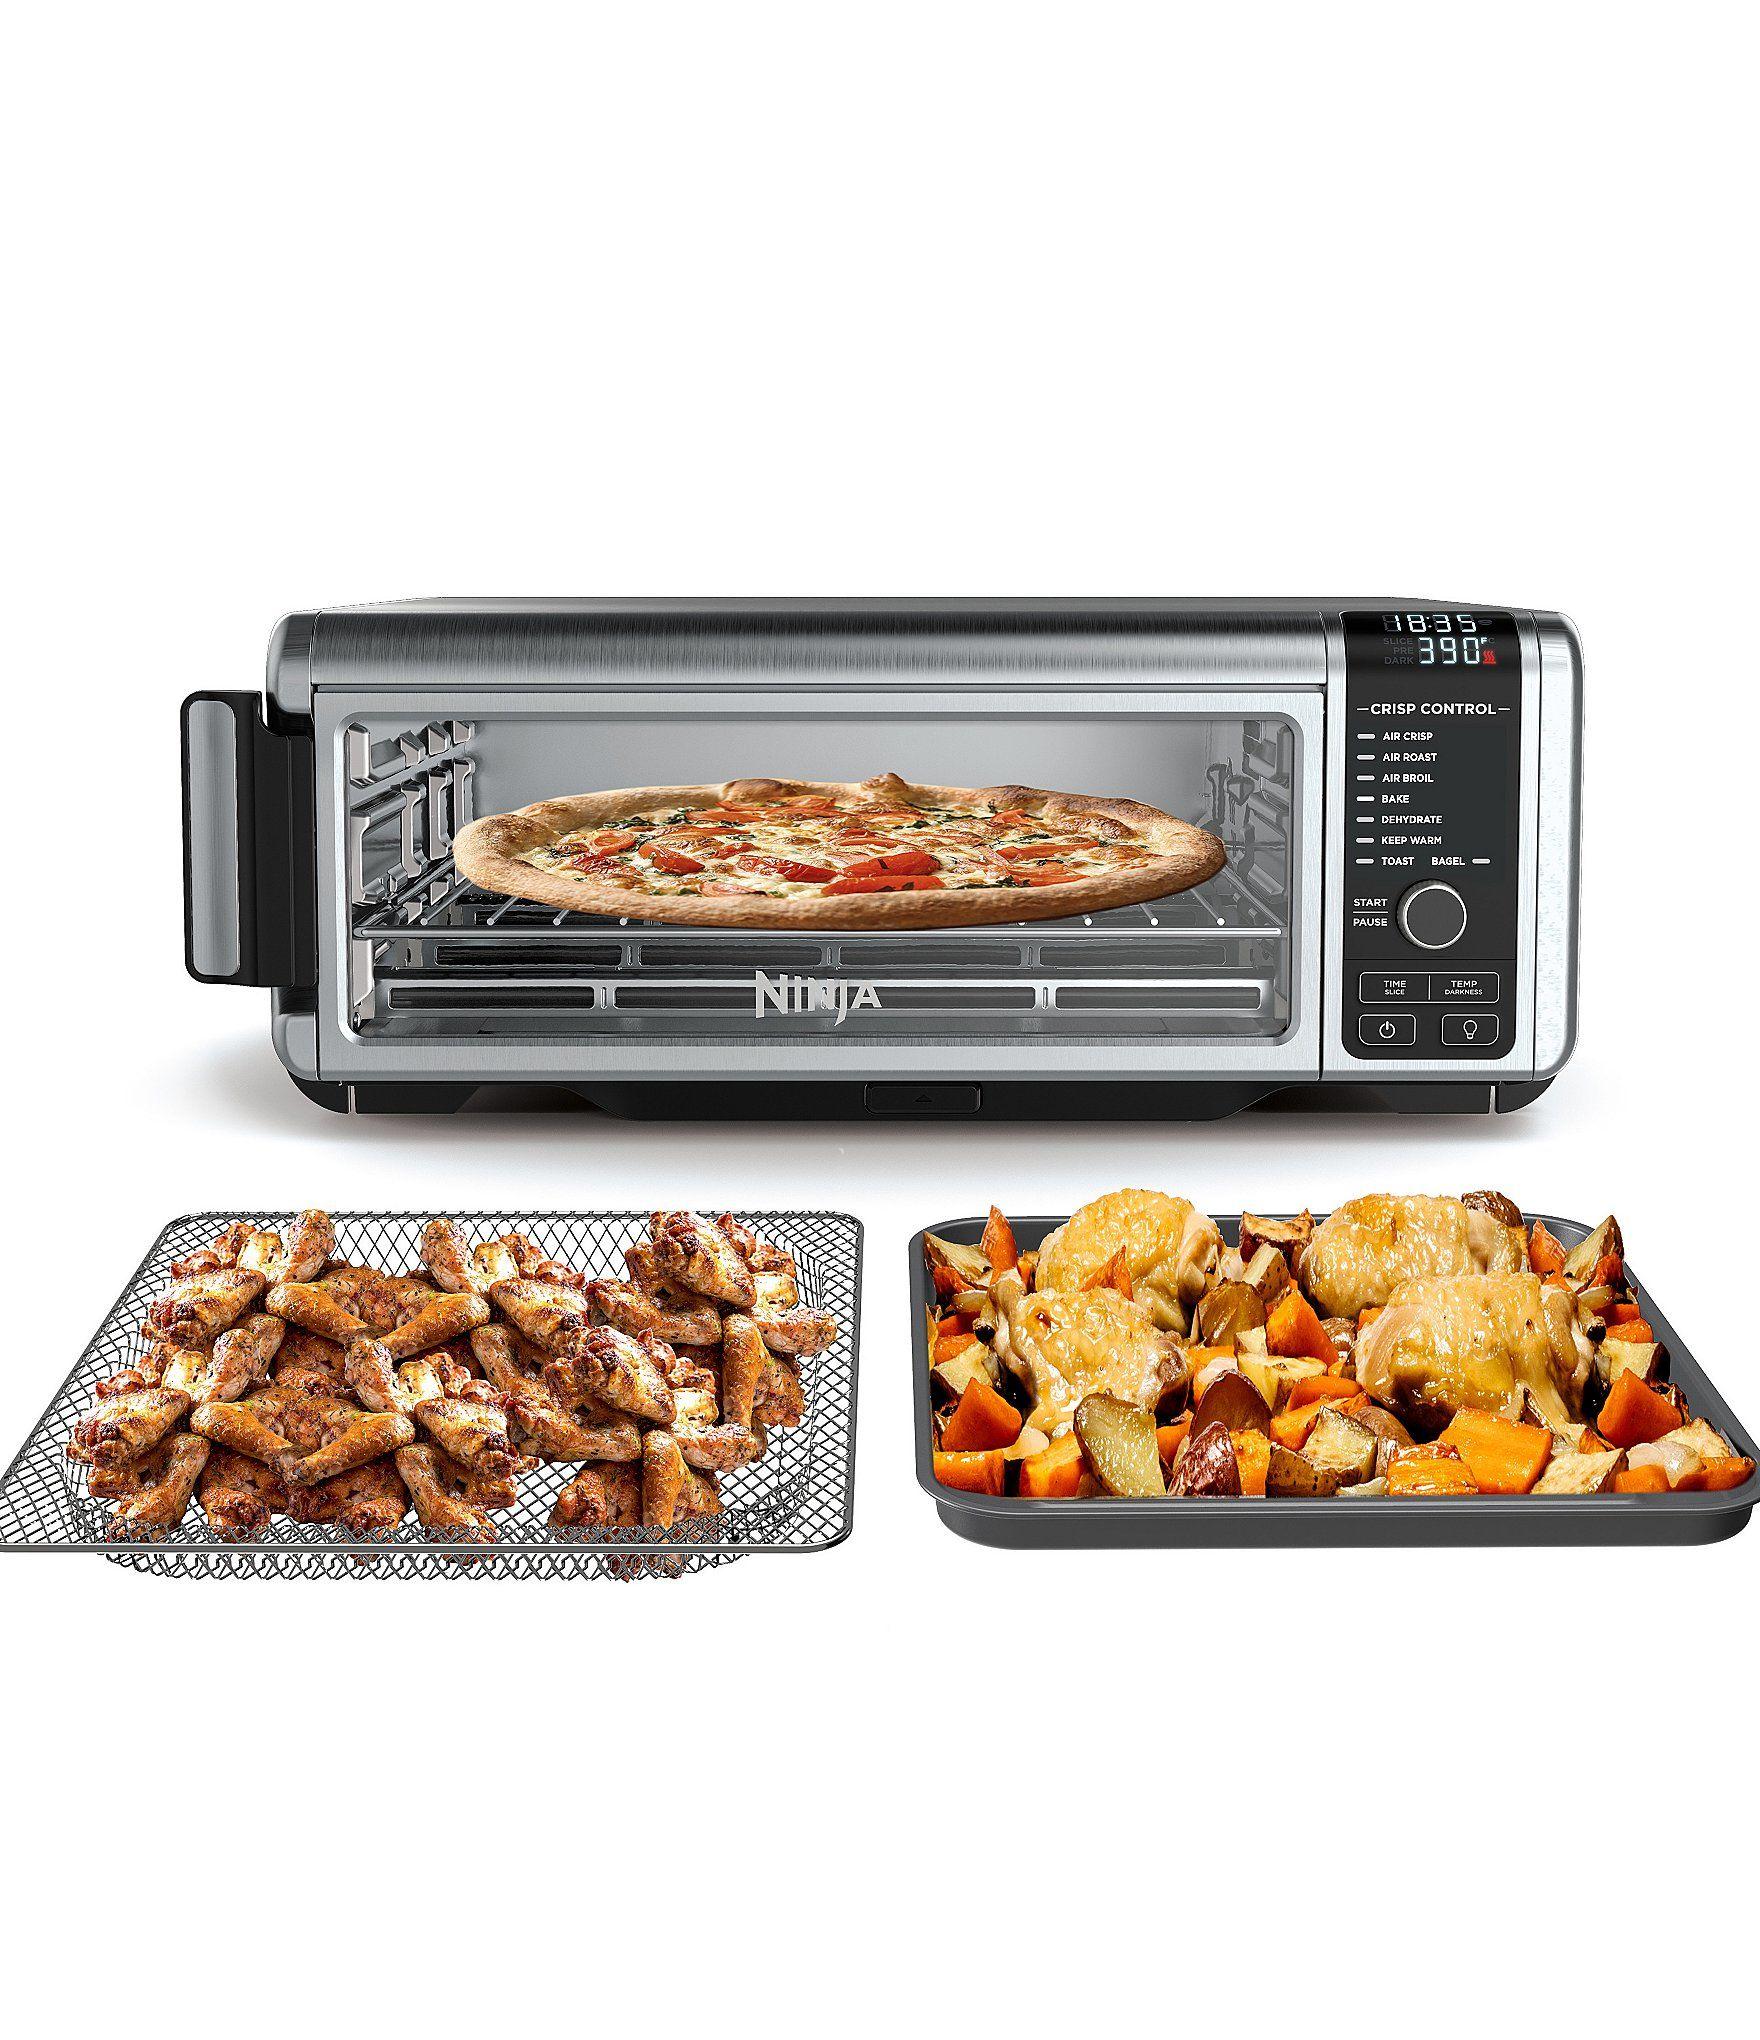 Ninja Foodi Digital Air Fry Oven N A N A In 2020 Oven Toaster